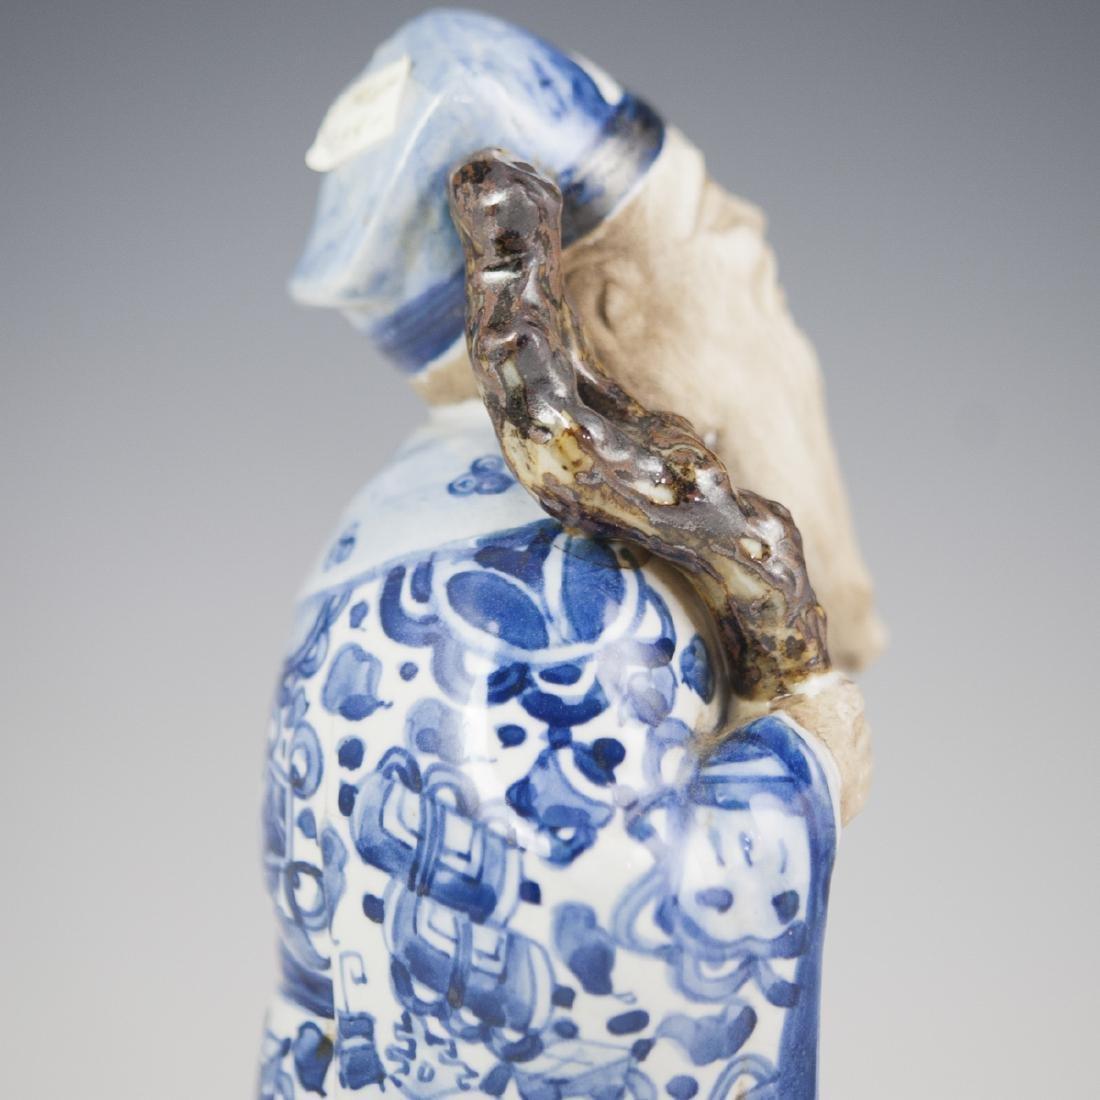 Chinese Glazed Pottery Shou Xing Figurine - 6